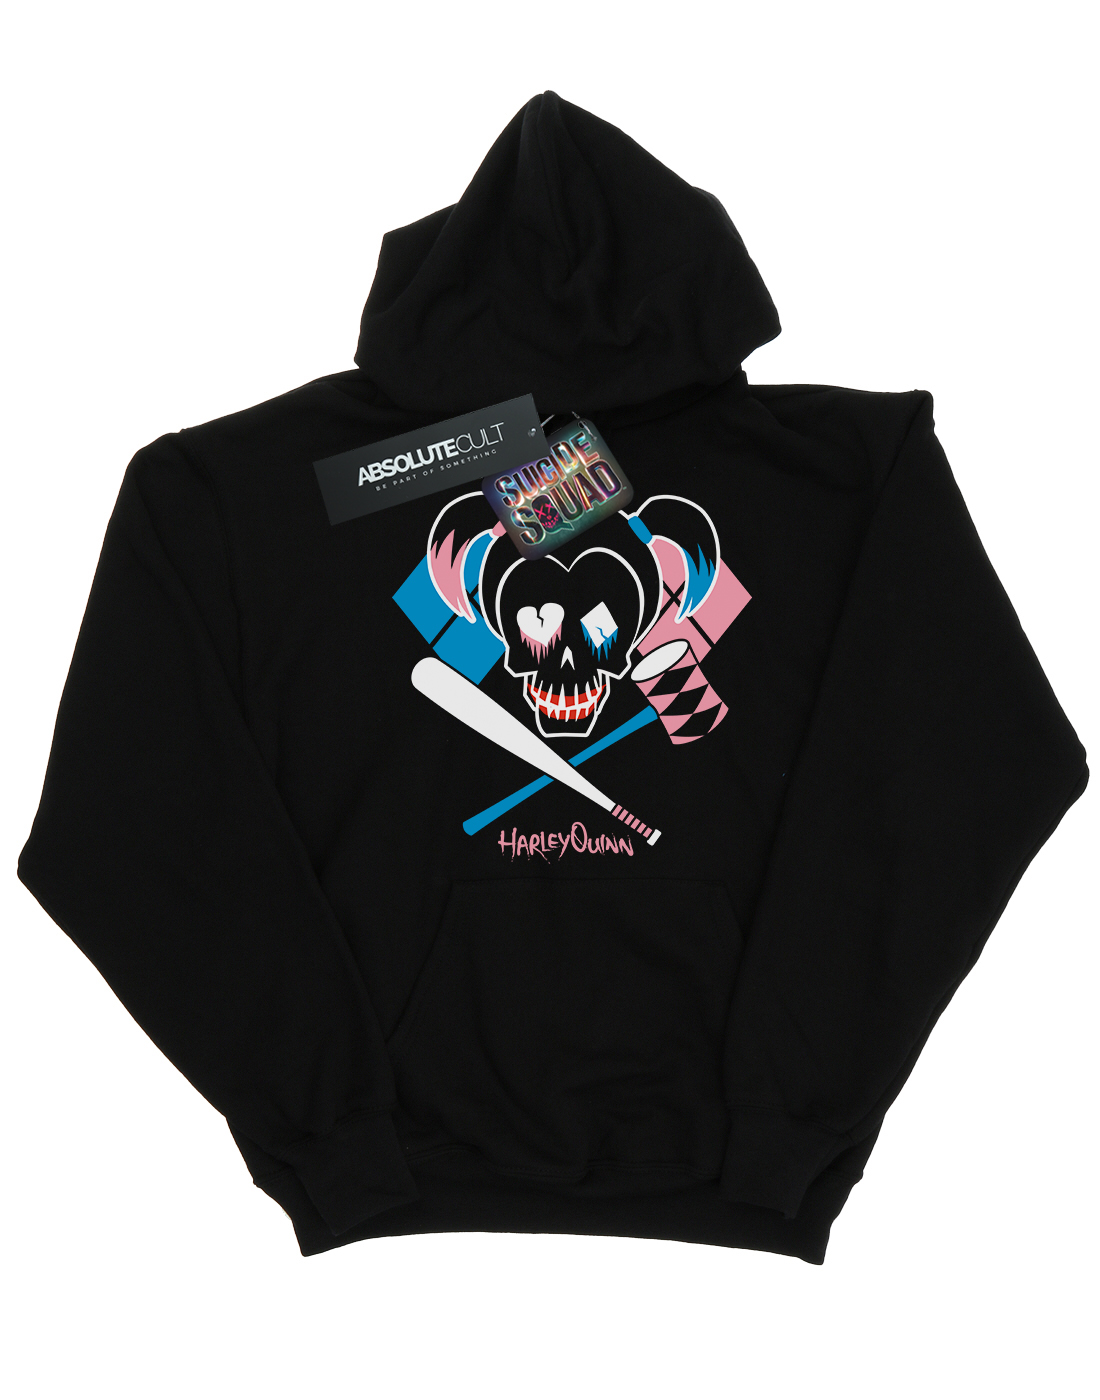 Squad Harley Con Skull Suicide Quinn Felpa Uomo Emblem Cappuccio qzE11Tdwn